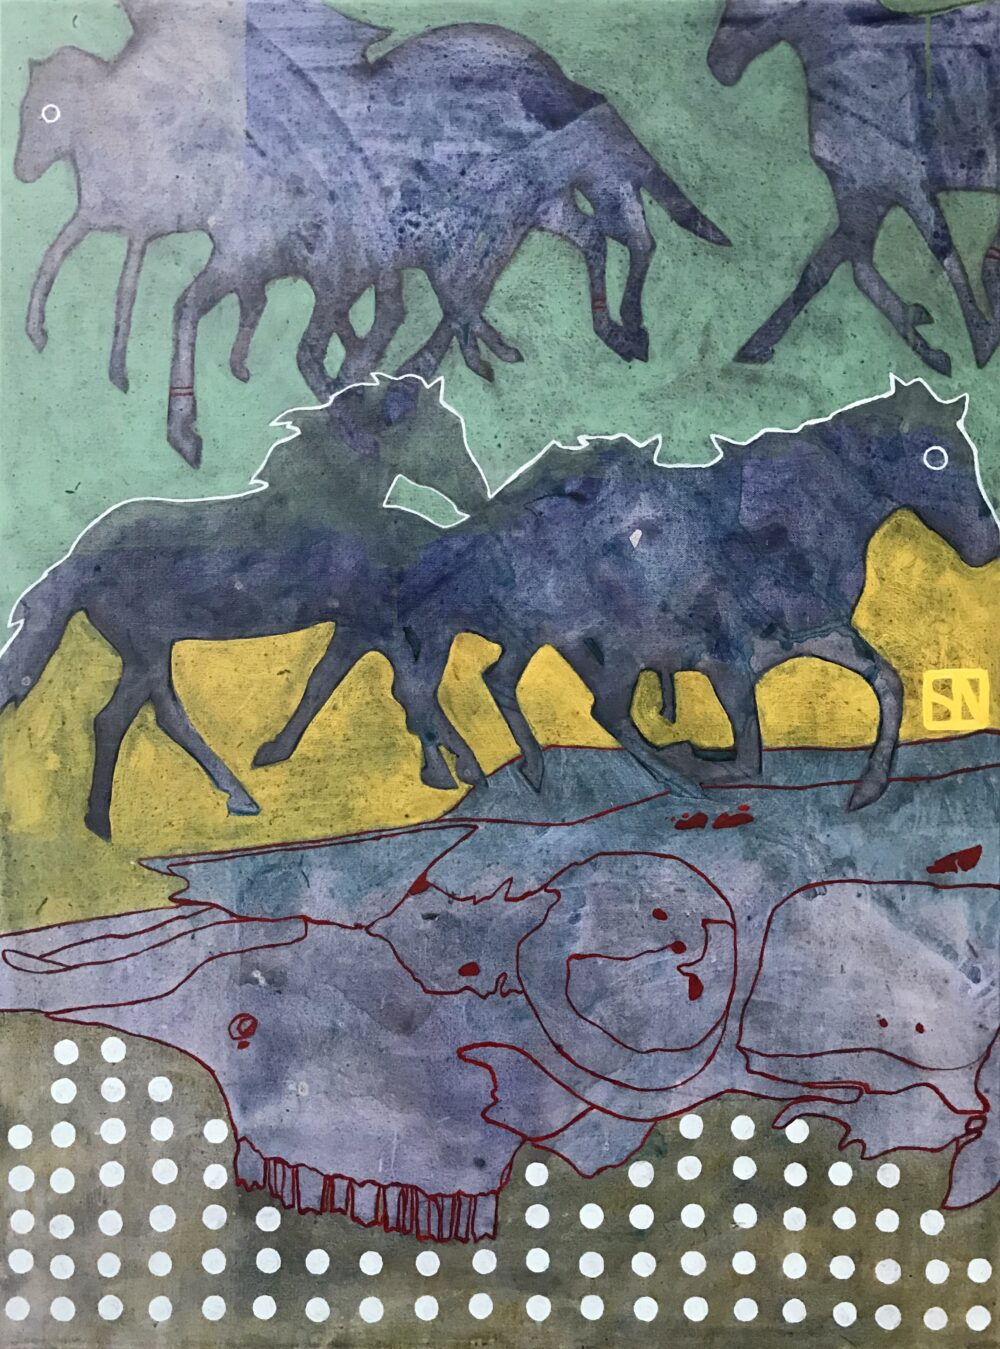 Sarsten Noice - War Ponies